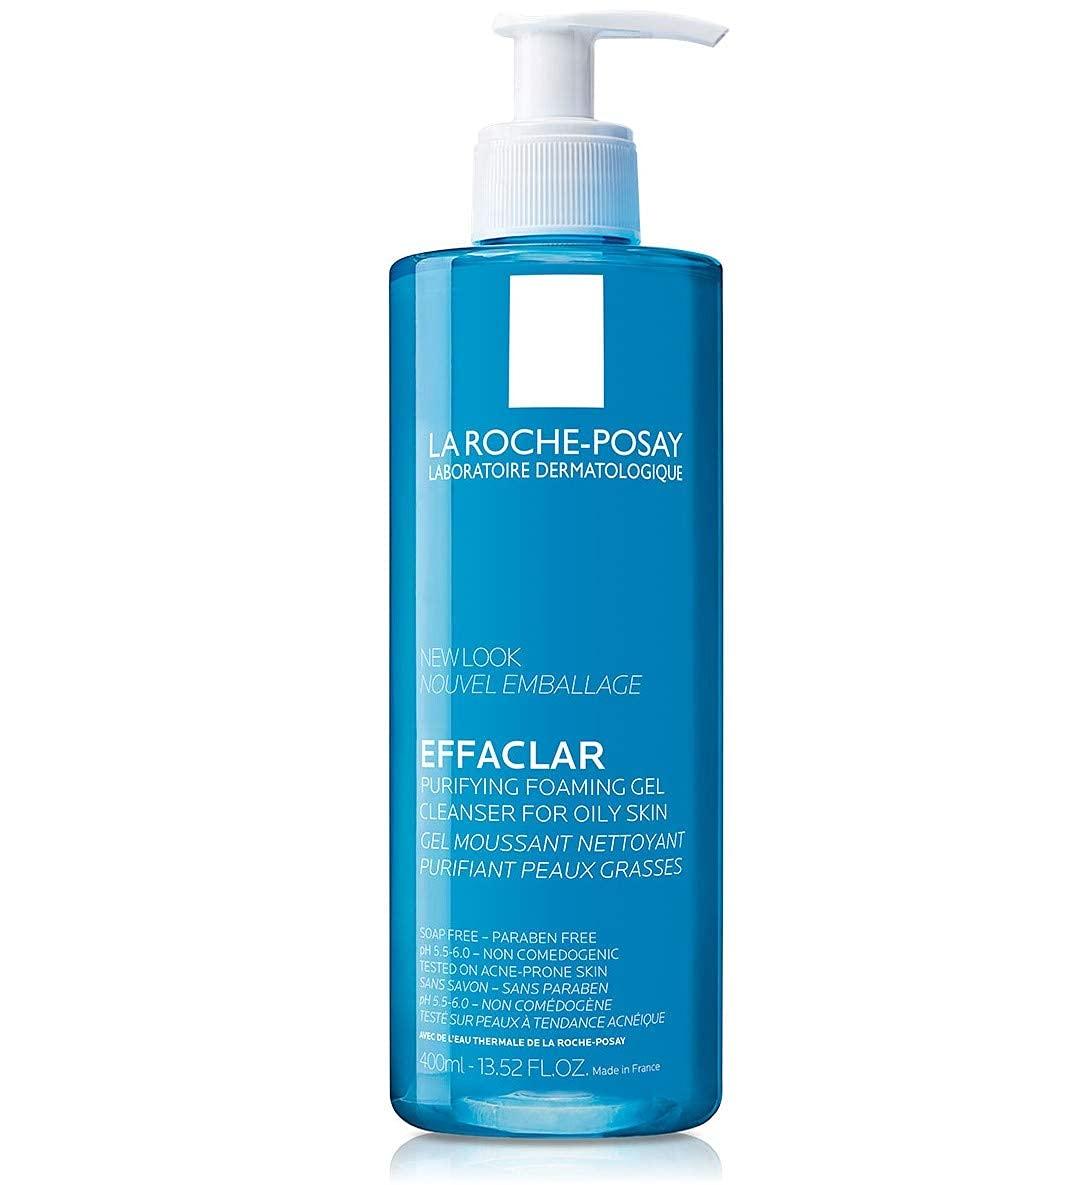 La Roche-Posay Effaclar Purifying Foaming Gel Cleanser for Oily Skin, 13.52 Fl Oz